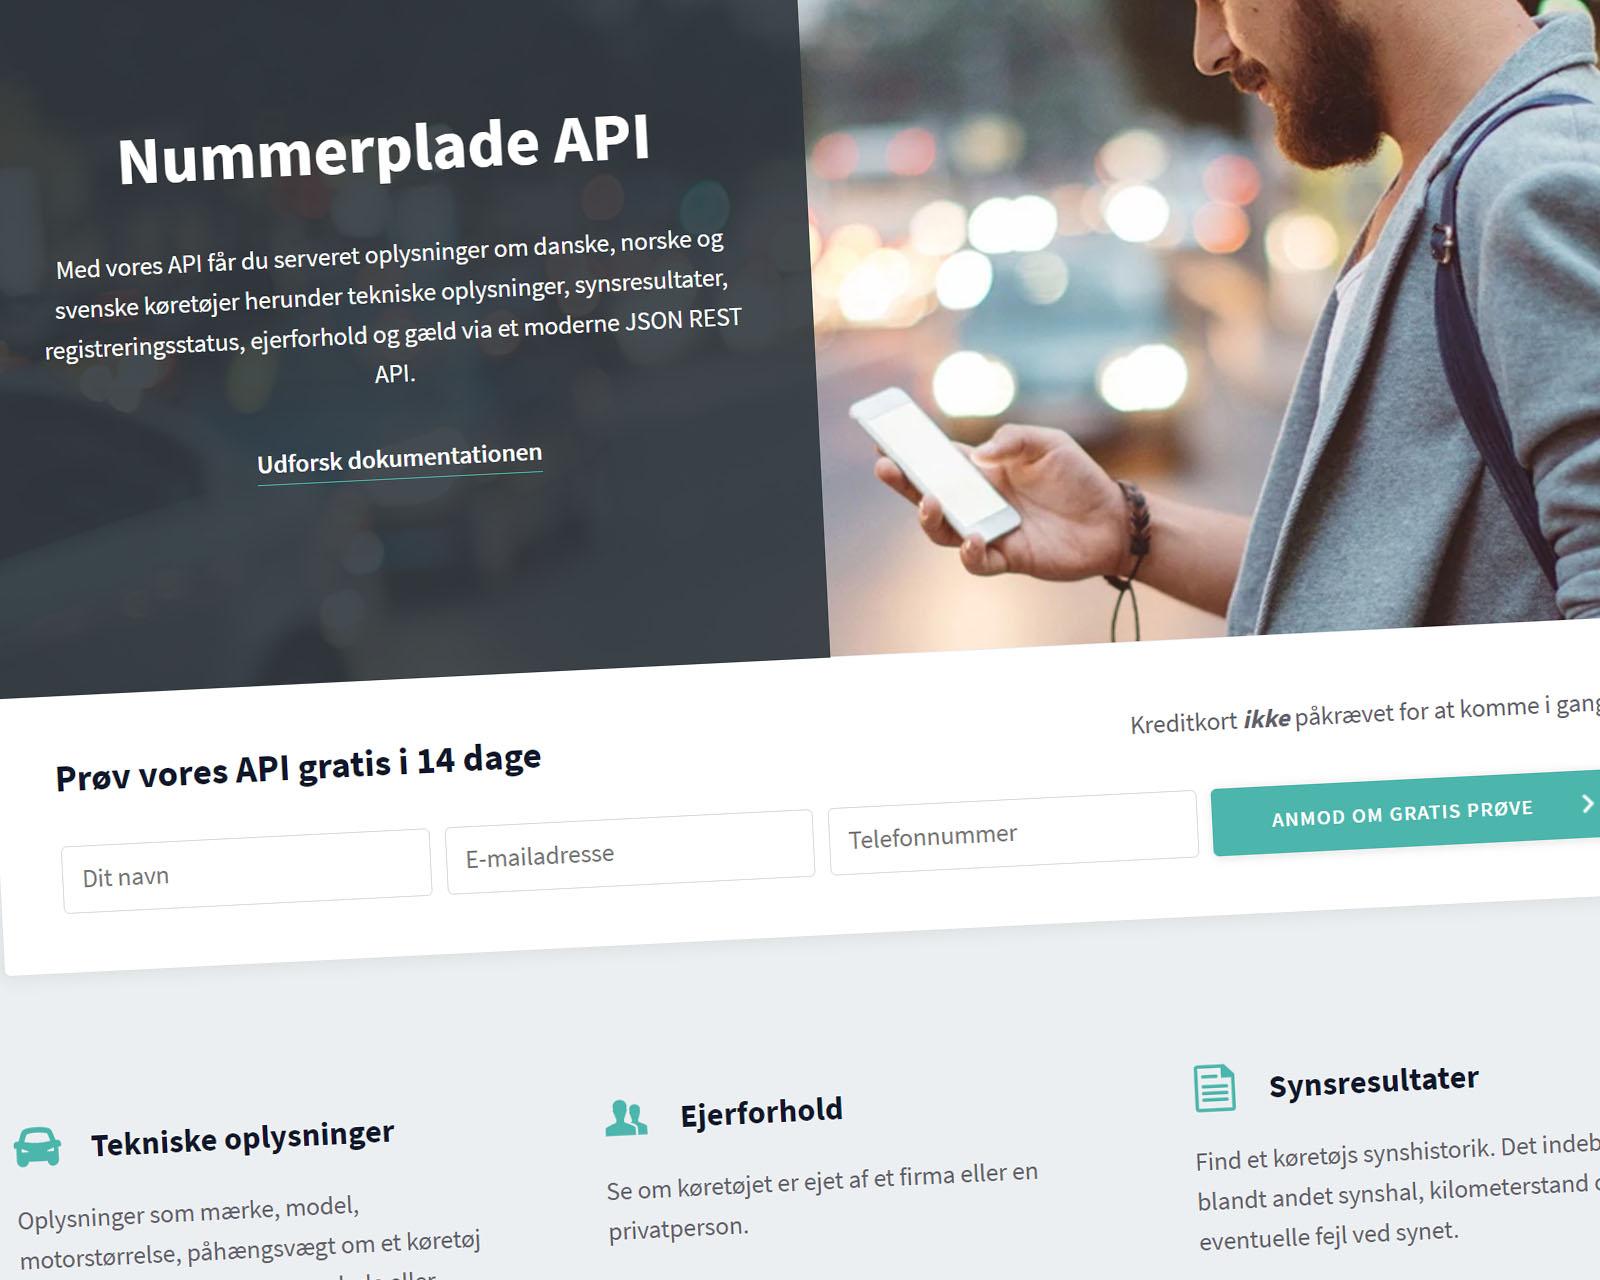 Nummerplade API